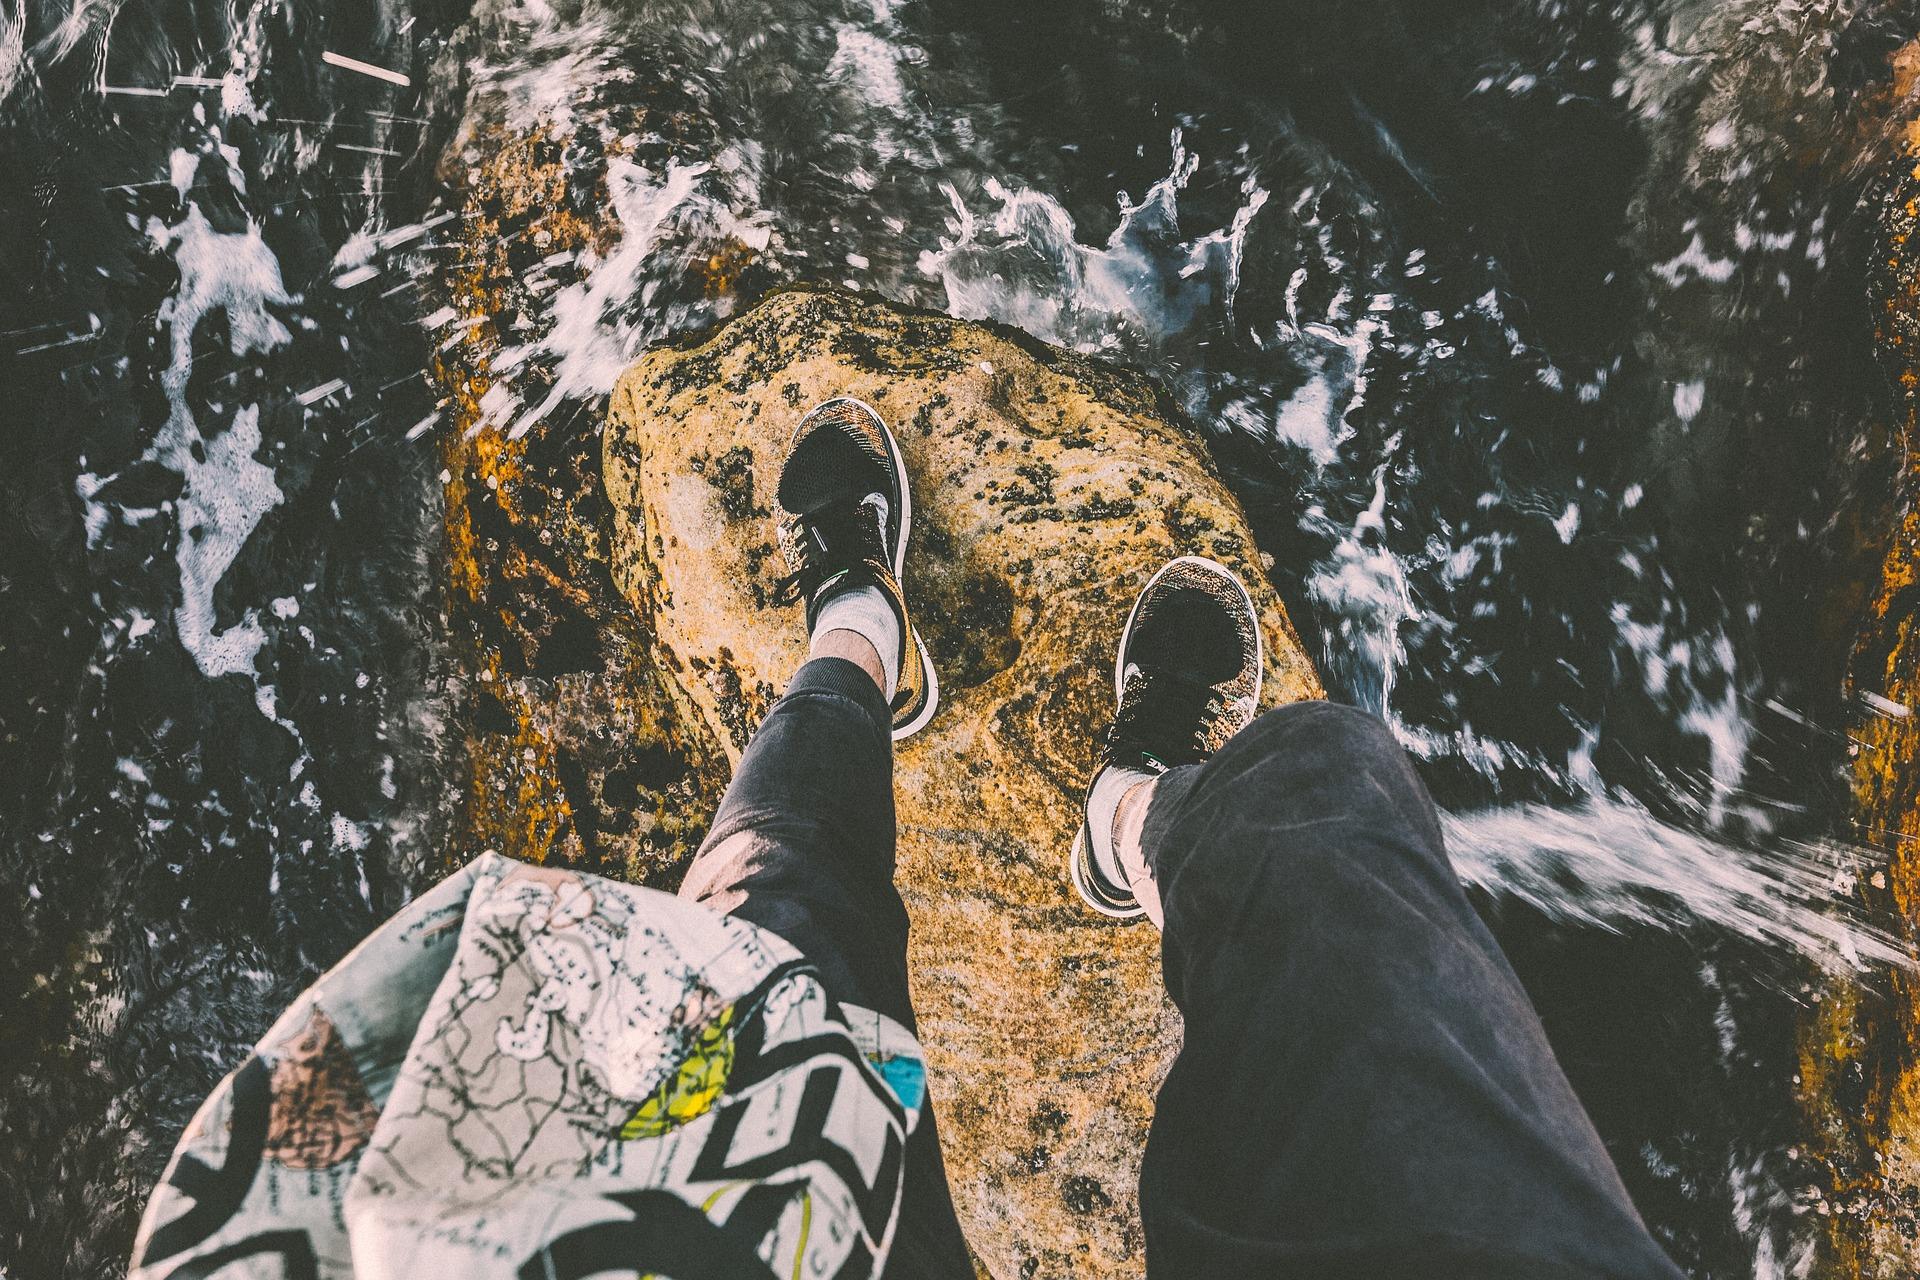 Pierre, pieds, chaussures, Falaise, femme, eau, Mer - Fonds d'écran HD - Professor-falken.com